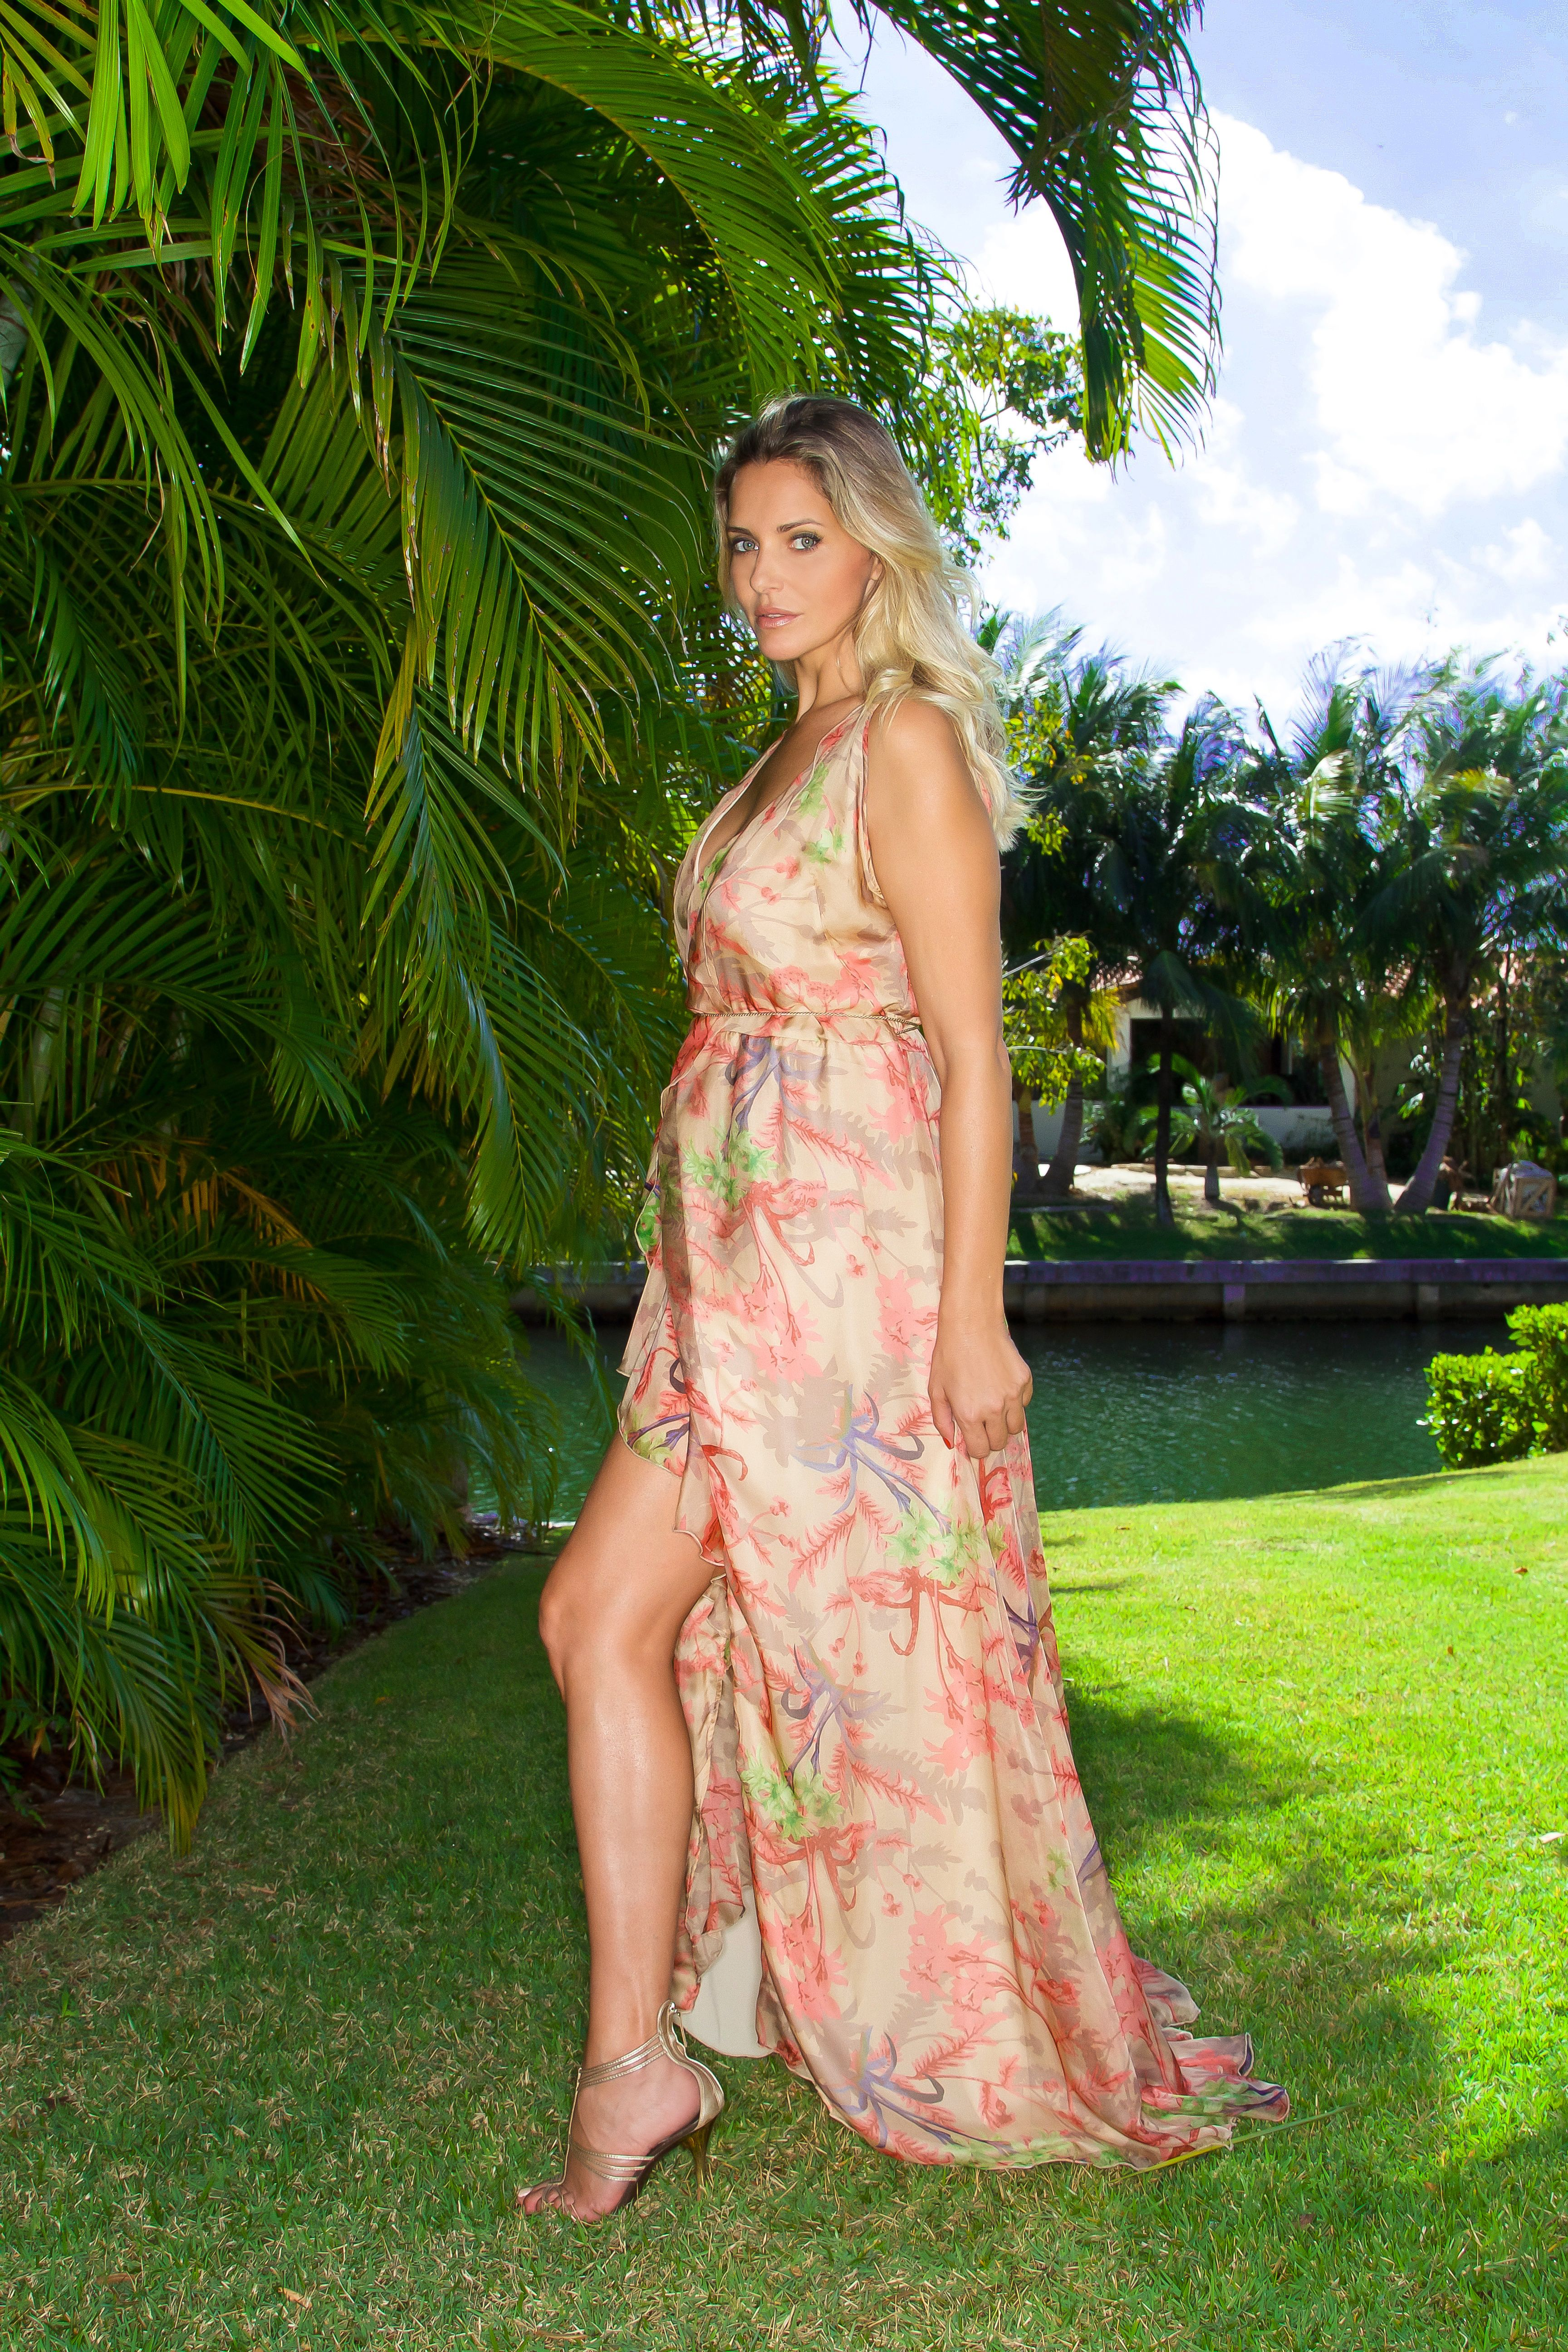 Dress Flamenco style in pure silk designed by Daniela Poggi #boholuxe #chic #oneofakind